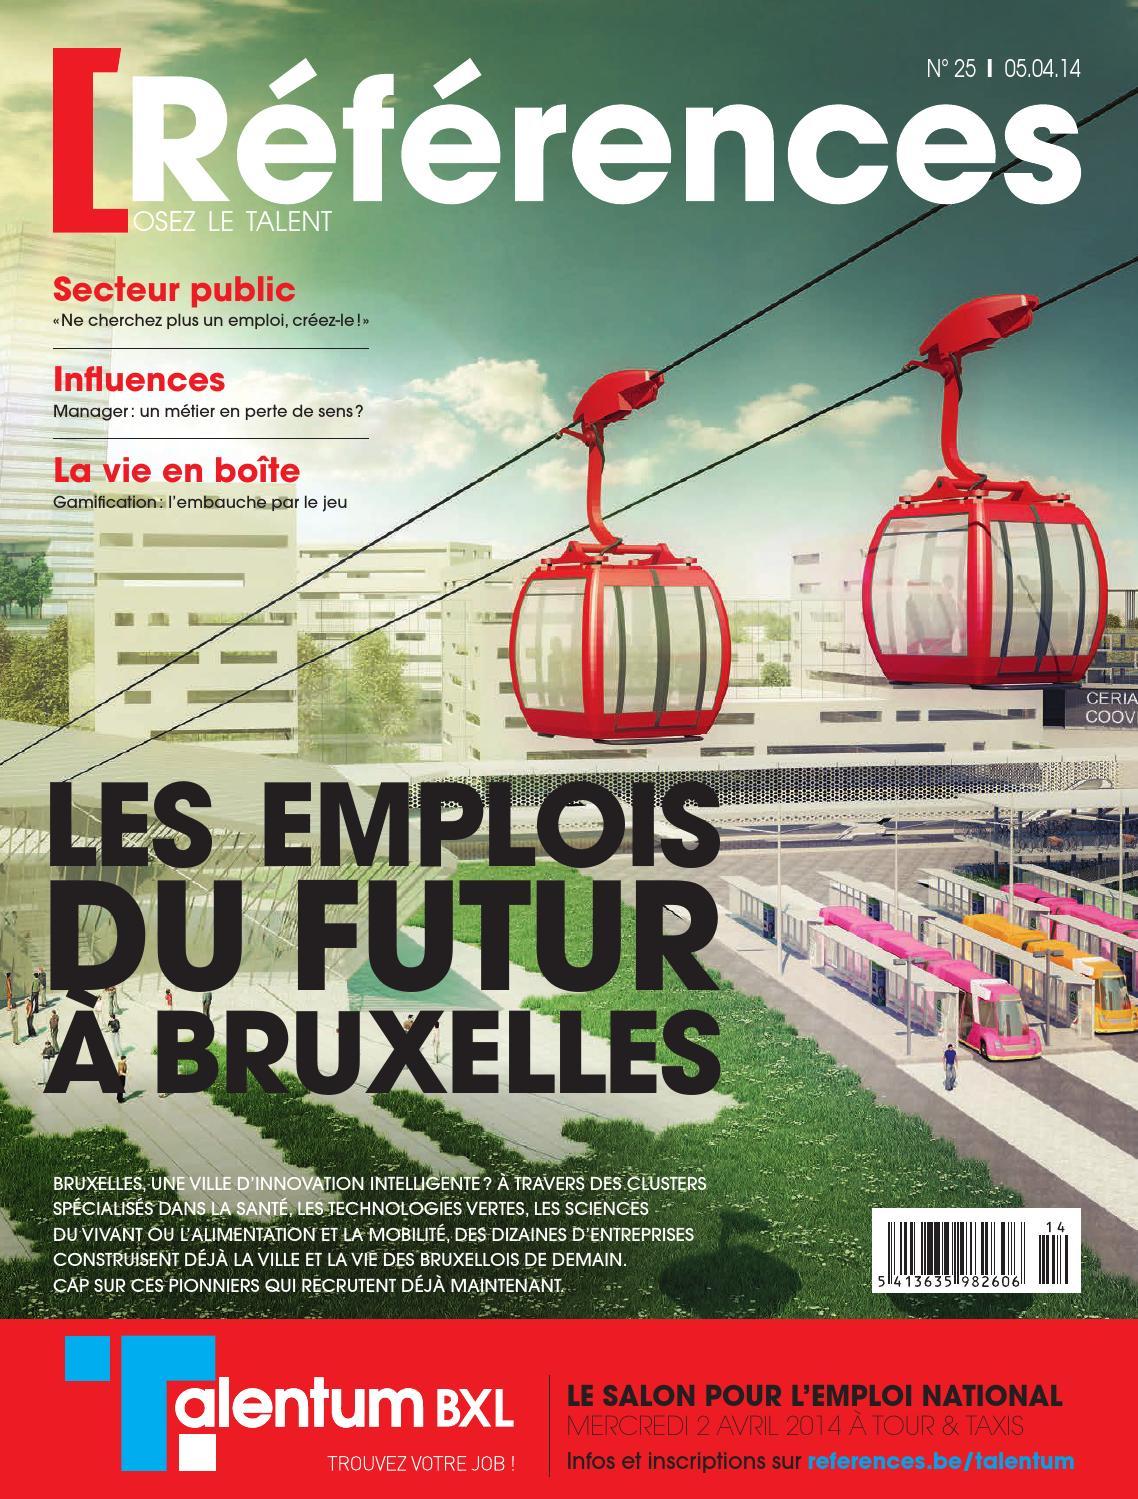 873f09f3018 Les emplois du futur à Bruxelles by Jobs   Careers CV - issuu